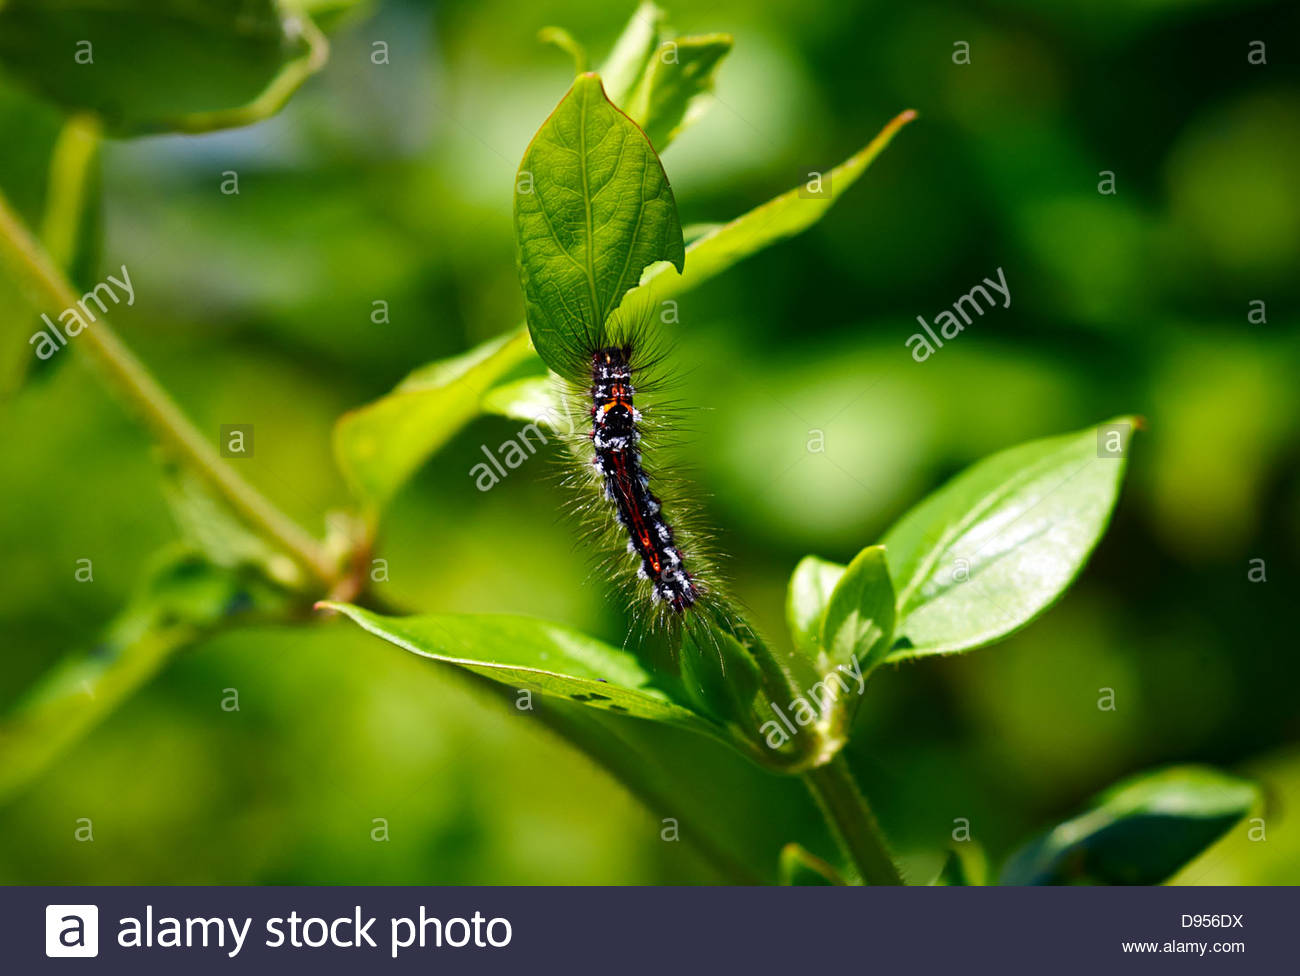 yellow Tail Motte Euproctis Similis Raupe Essen Geißblatt lässt Stockbild